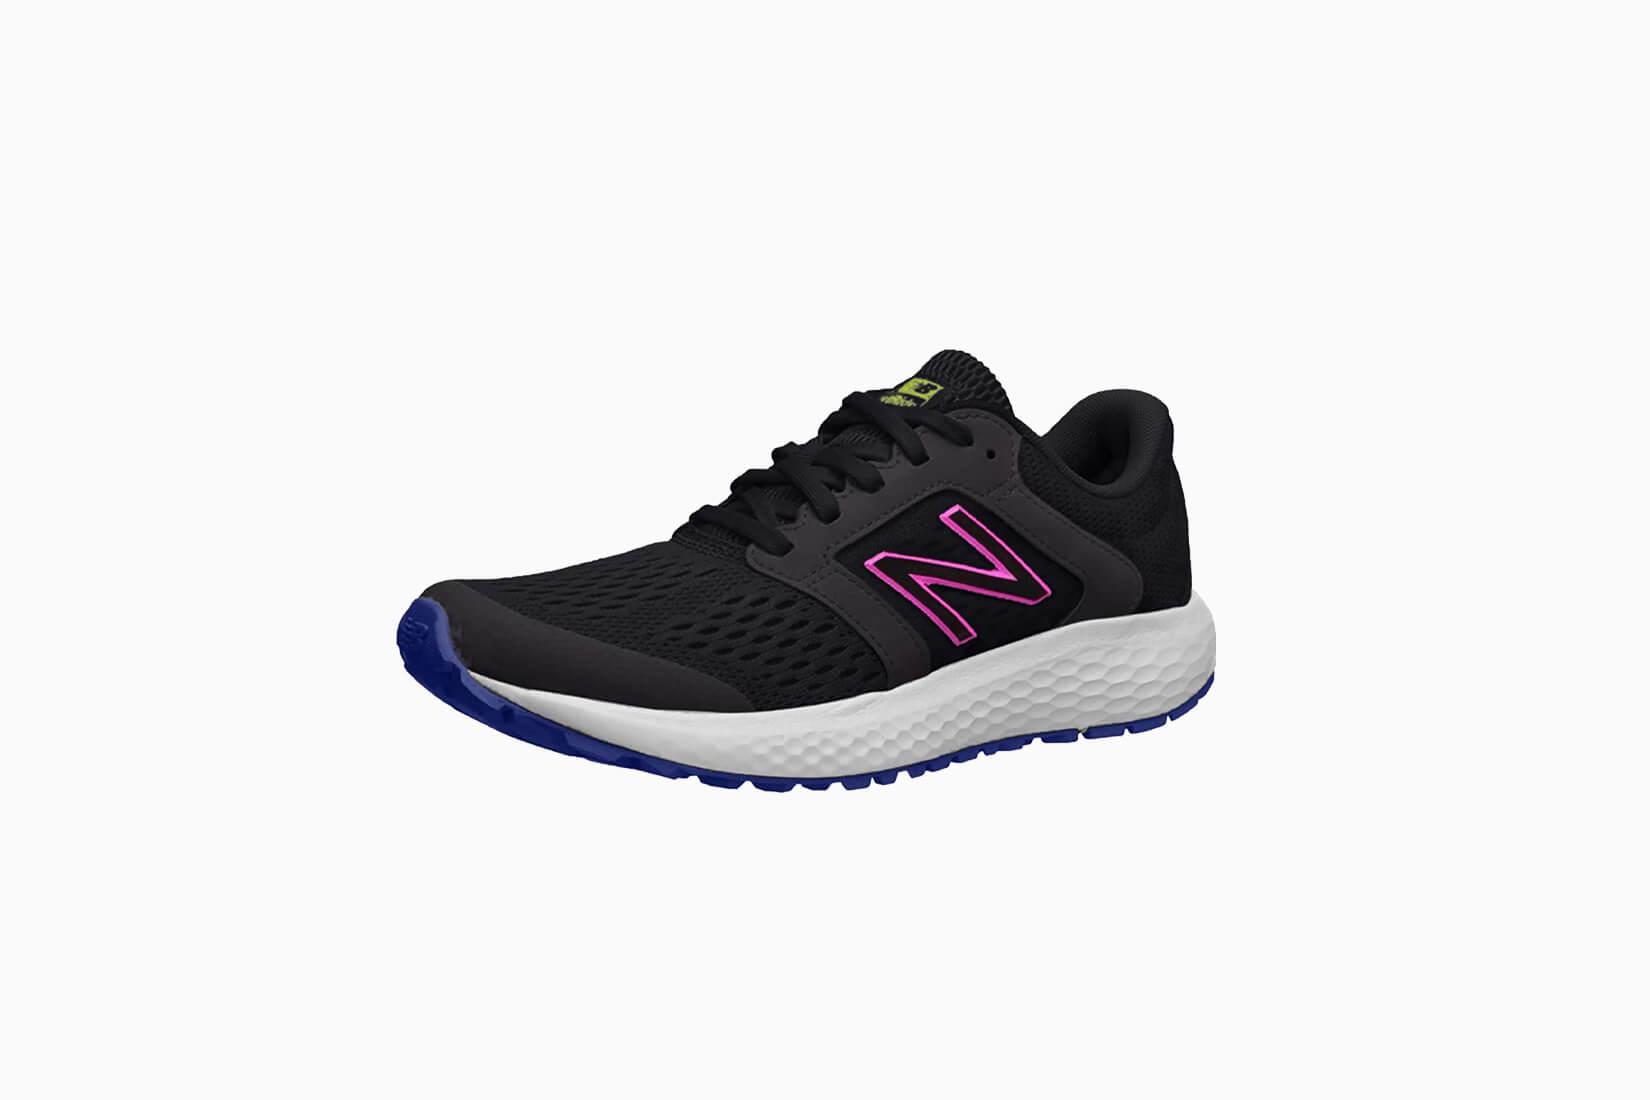 best workout shoes women new balance 520 review - Luxe Digital